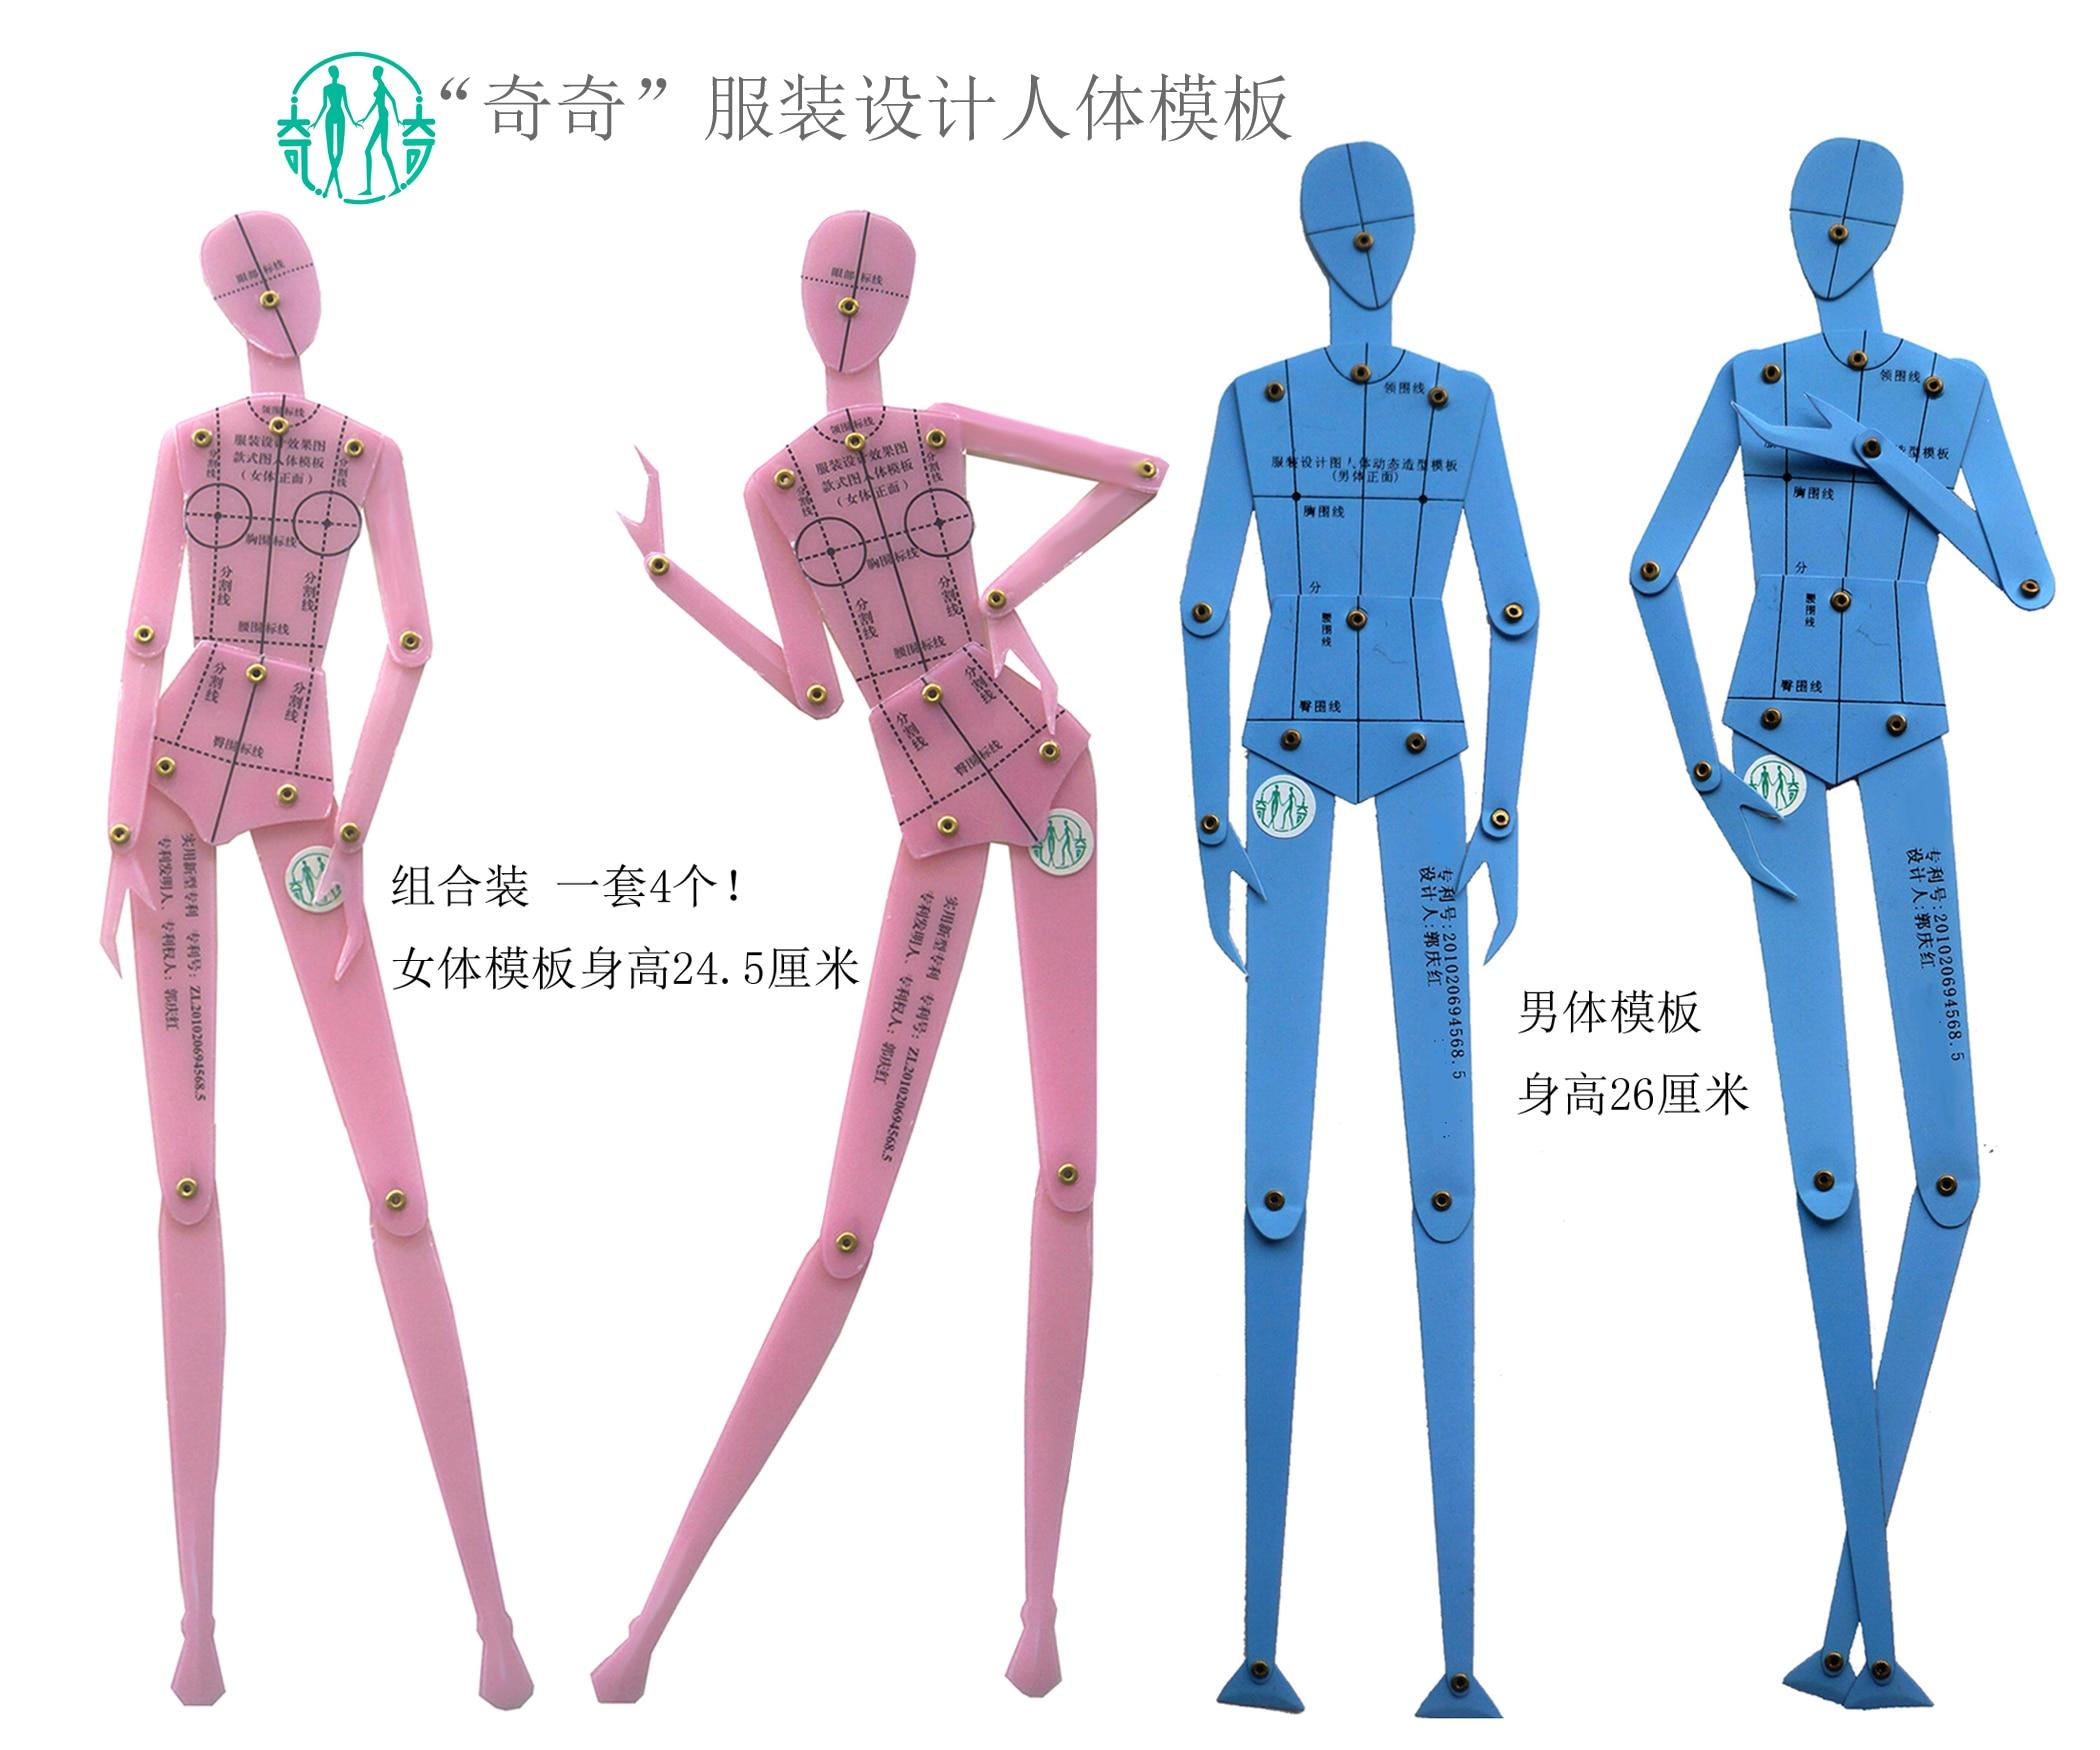 4Pcs Fashion Drawing Ruler Garment Design Of Human Body Dynamic Hand Drawing Template Ruler Women Effect Drawing Style